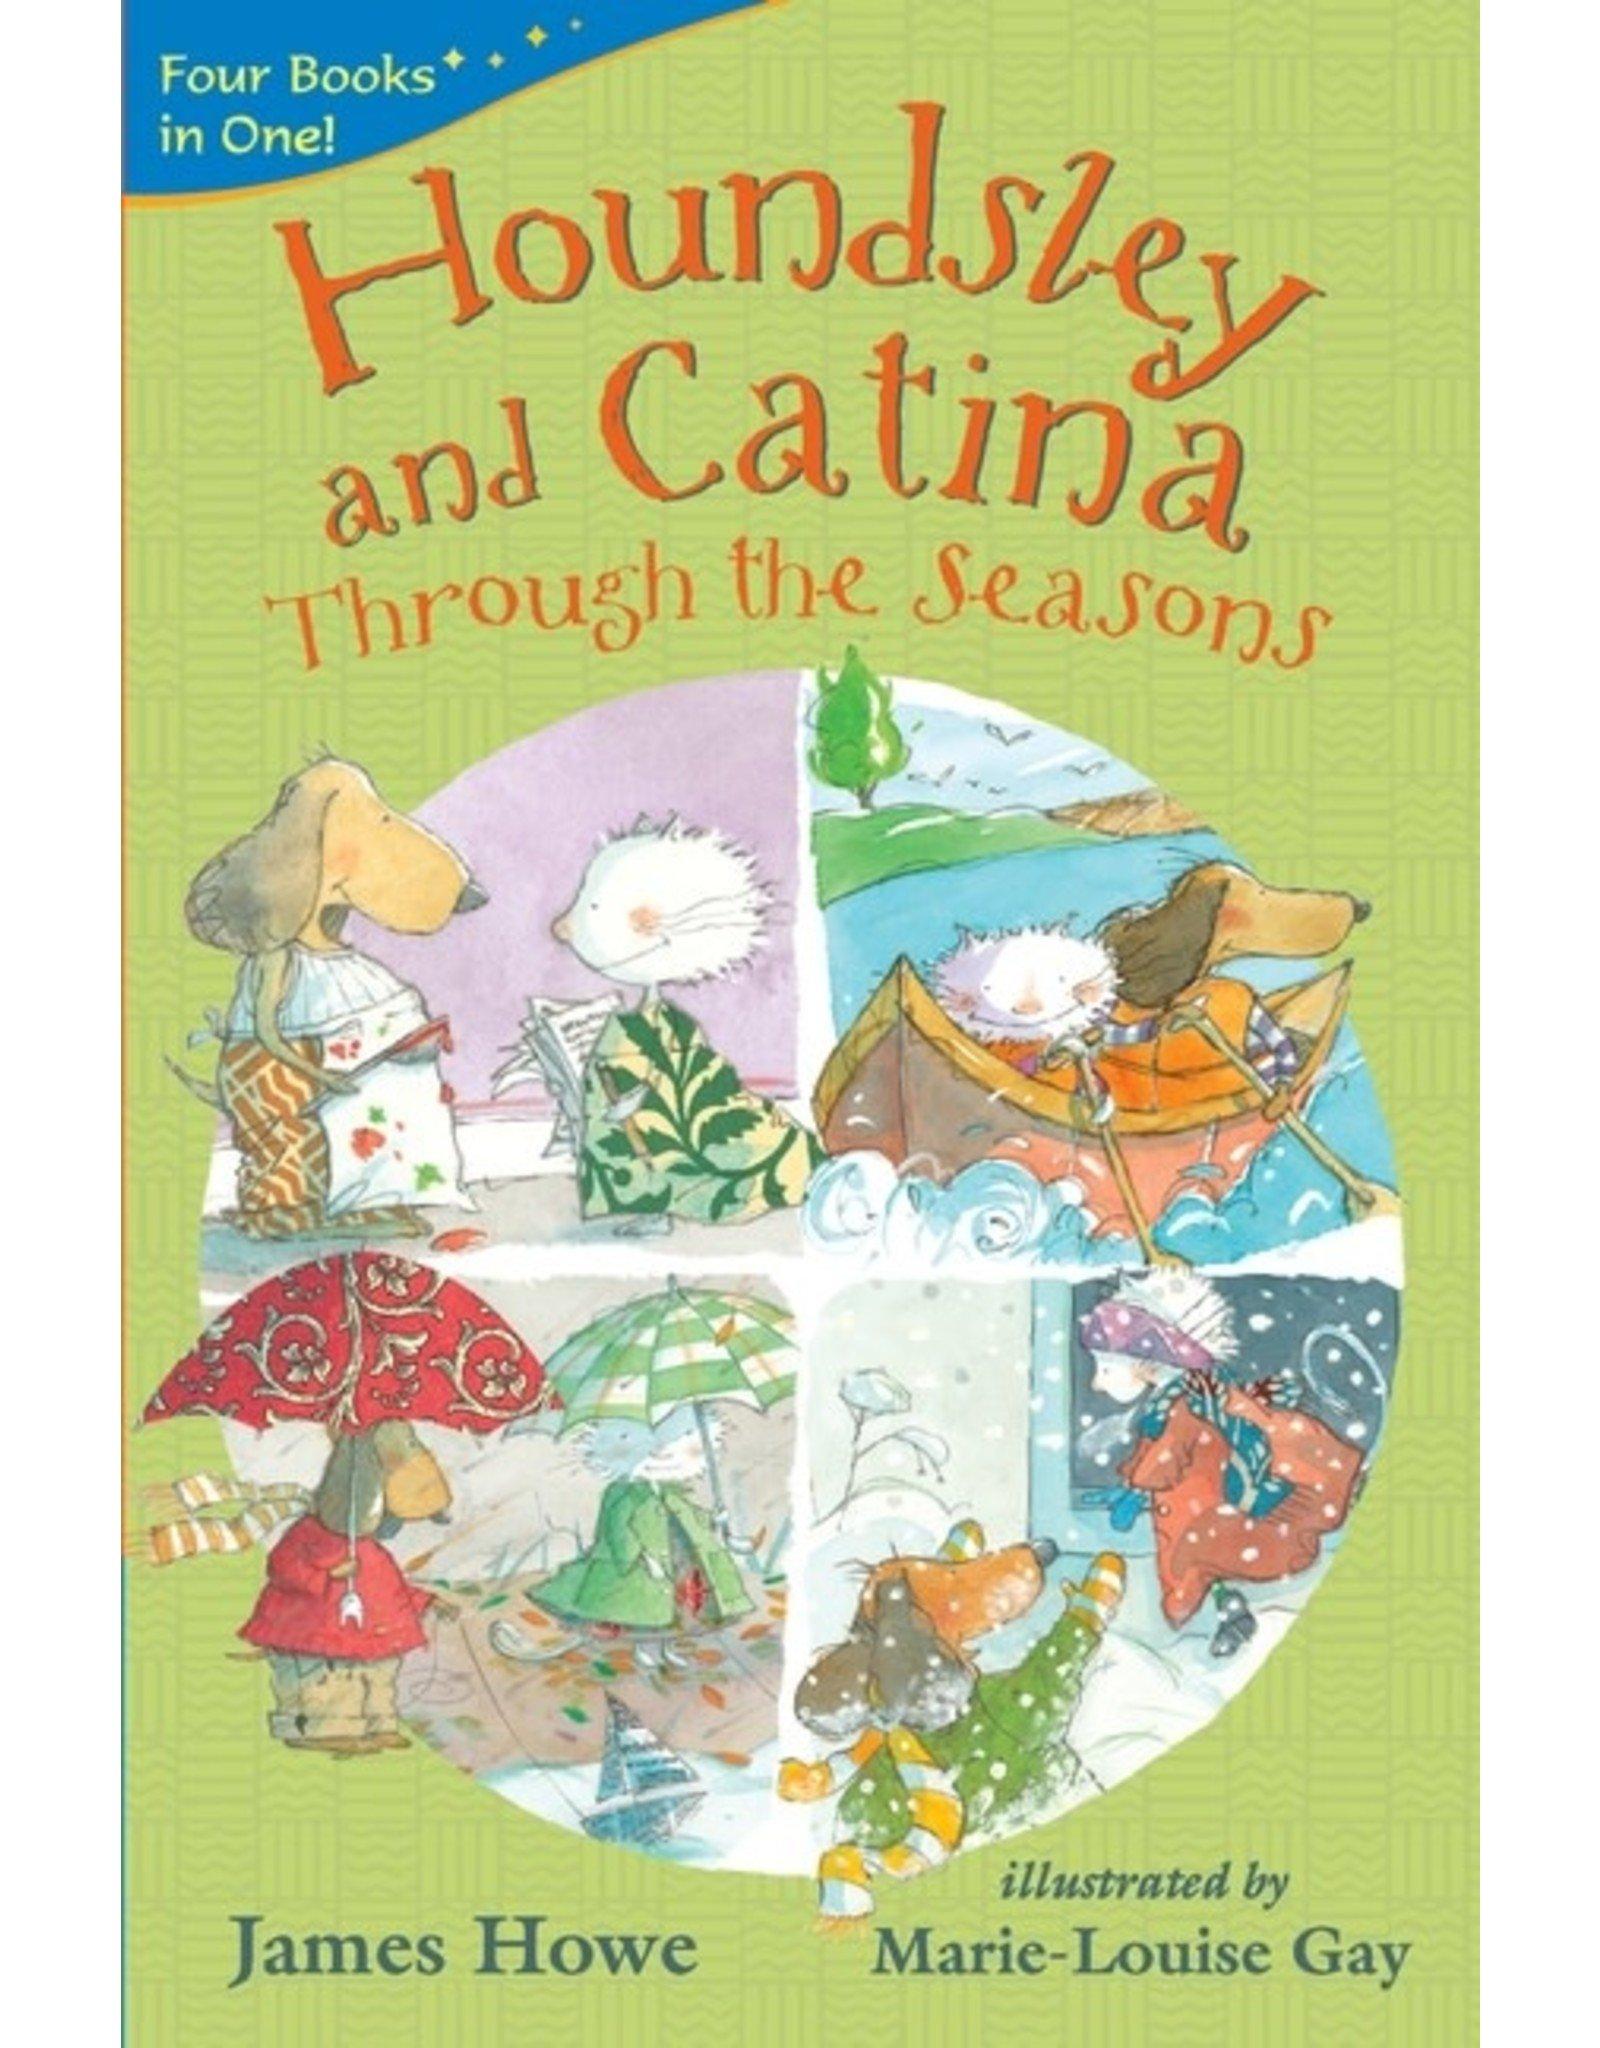 Candlewick Houndsley & Catina Through the Seasons